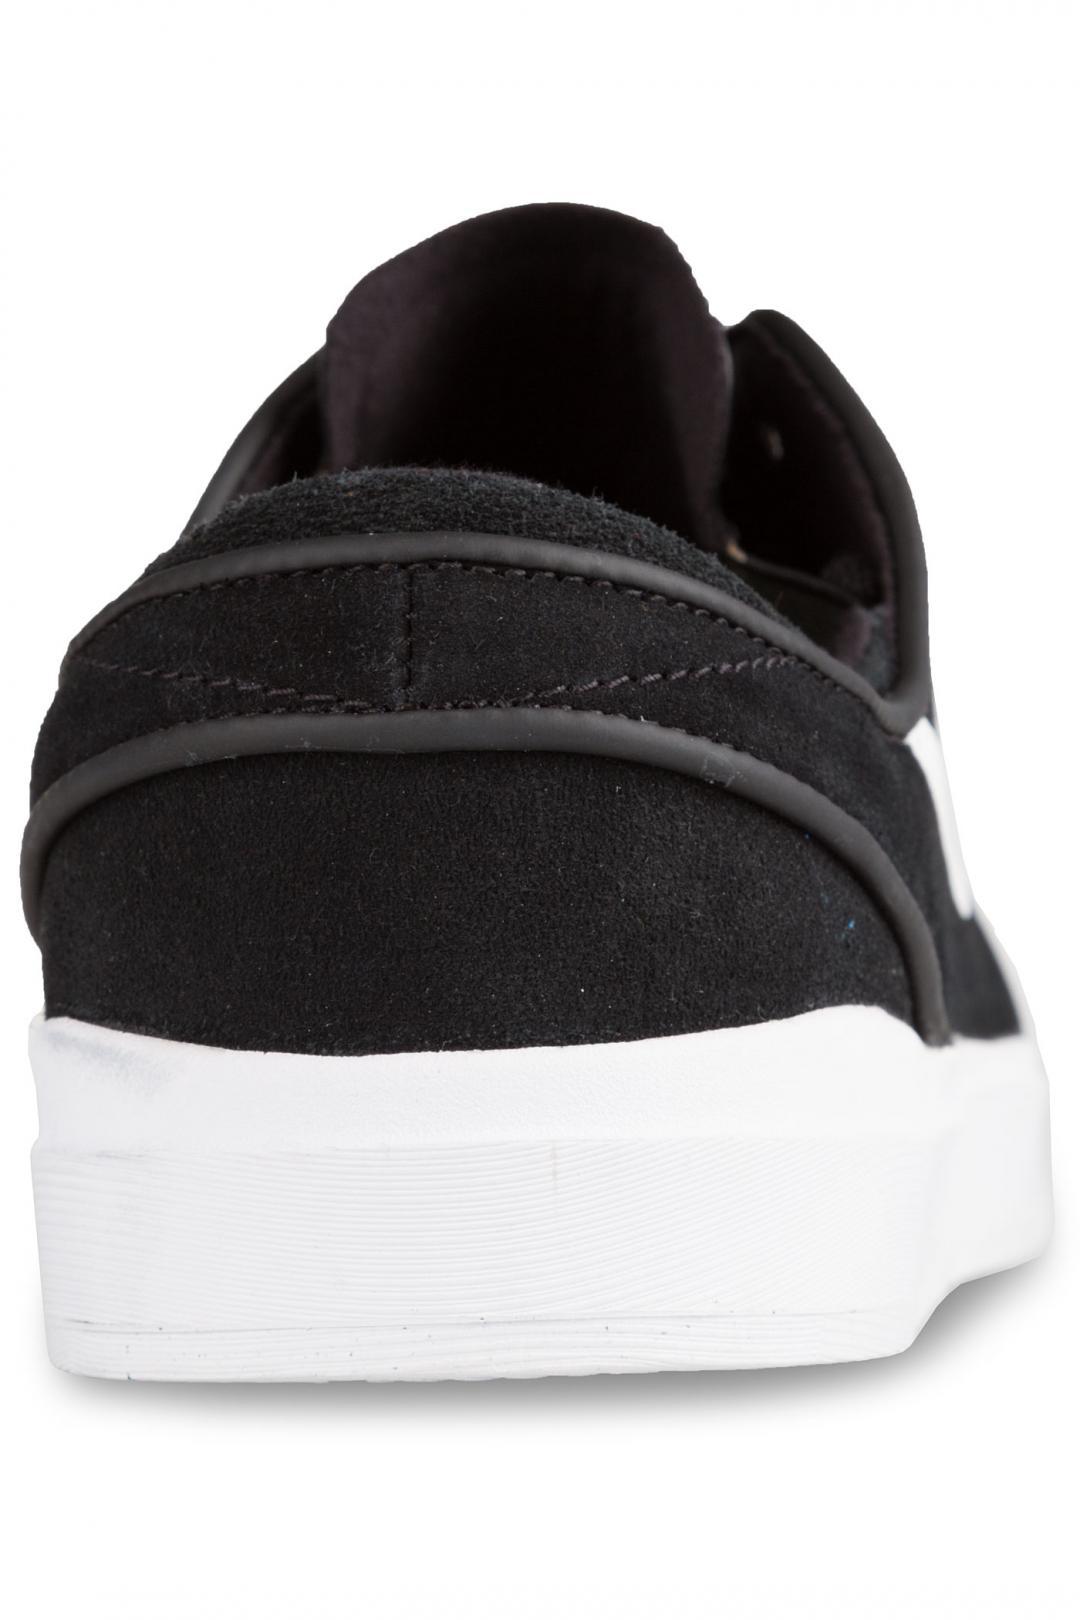 Uomo Nike SB Stefan Janoski Hyperfeel black white   Scarpe da skate